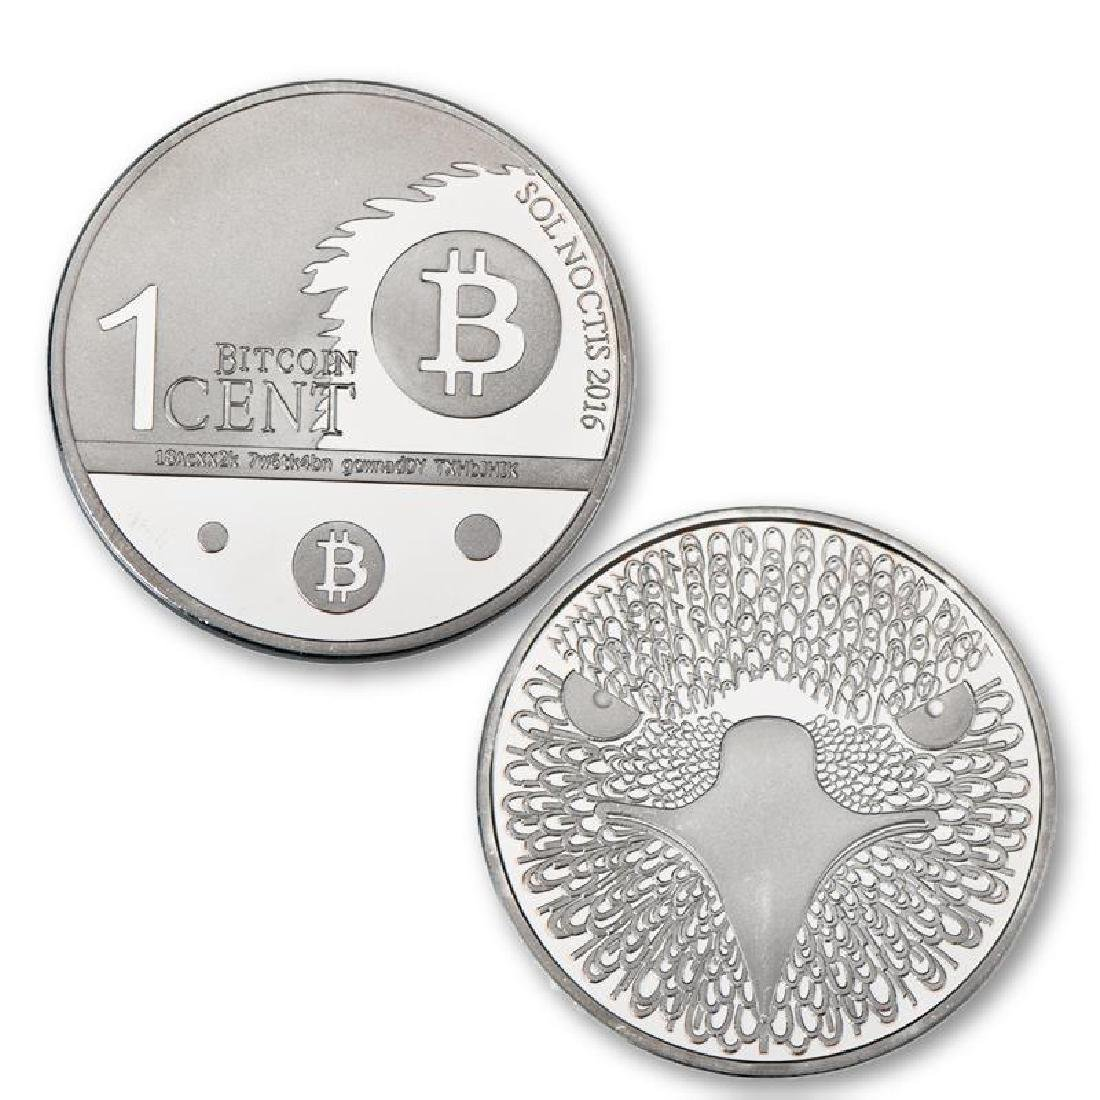 4 Bitcoin Silver and Gold Clad Collectible Coins - 5